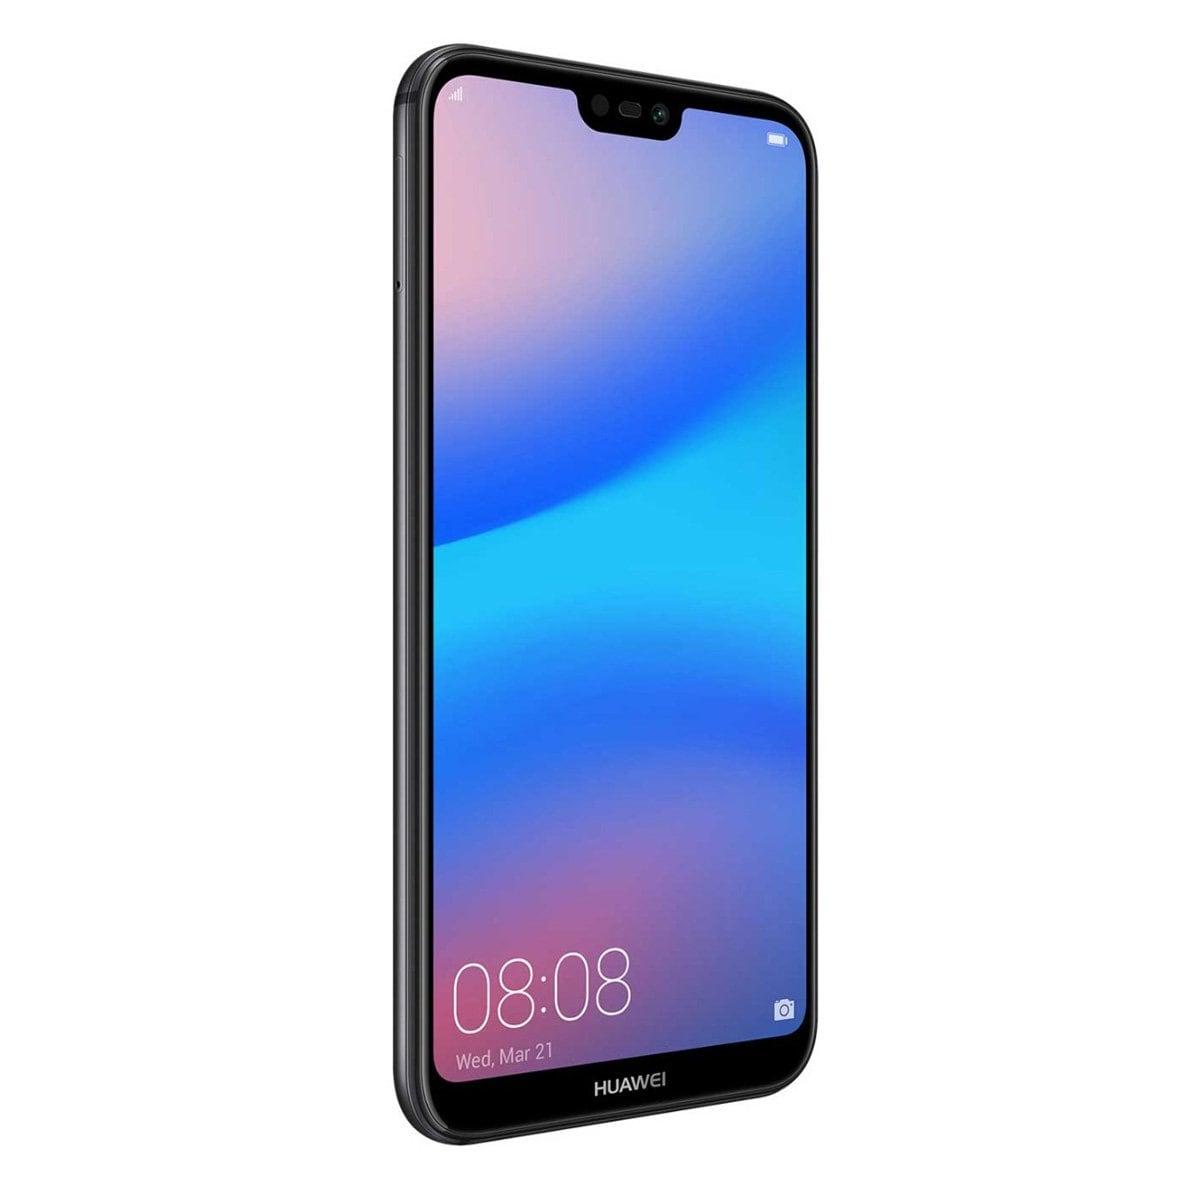 Celular Huawei P20 Lite Ane-Lx3 Color Negro R9 (Telcel)